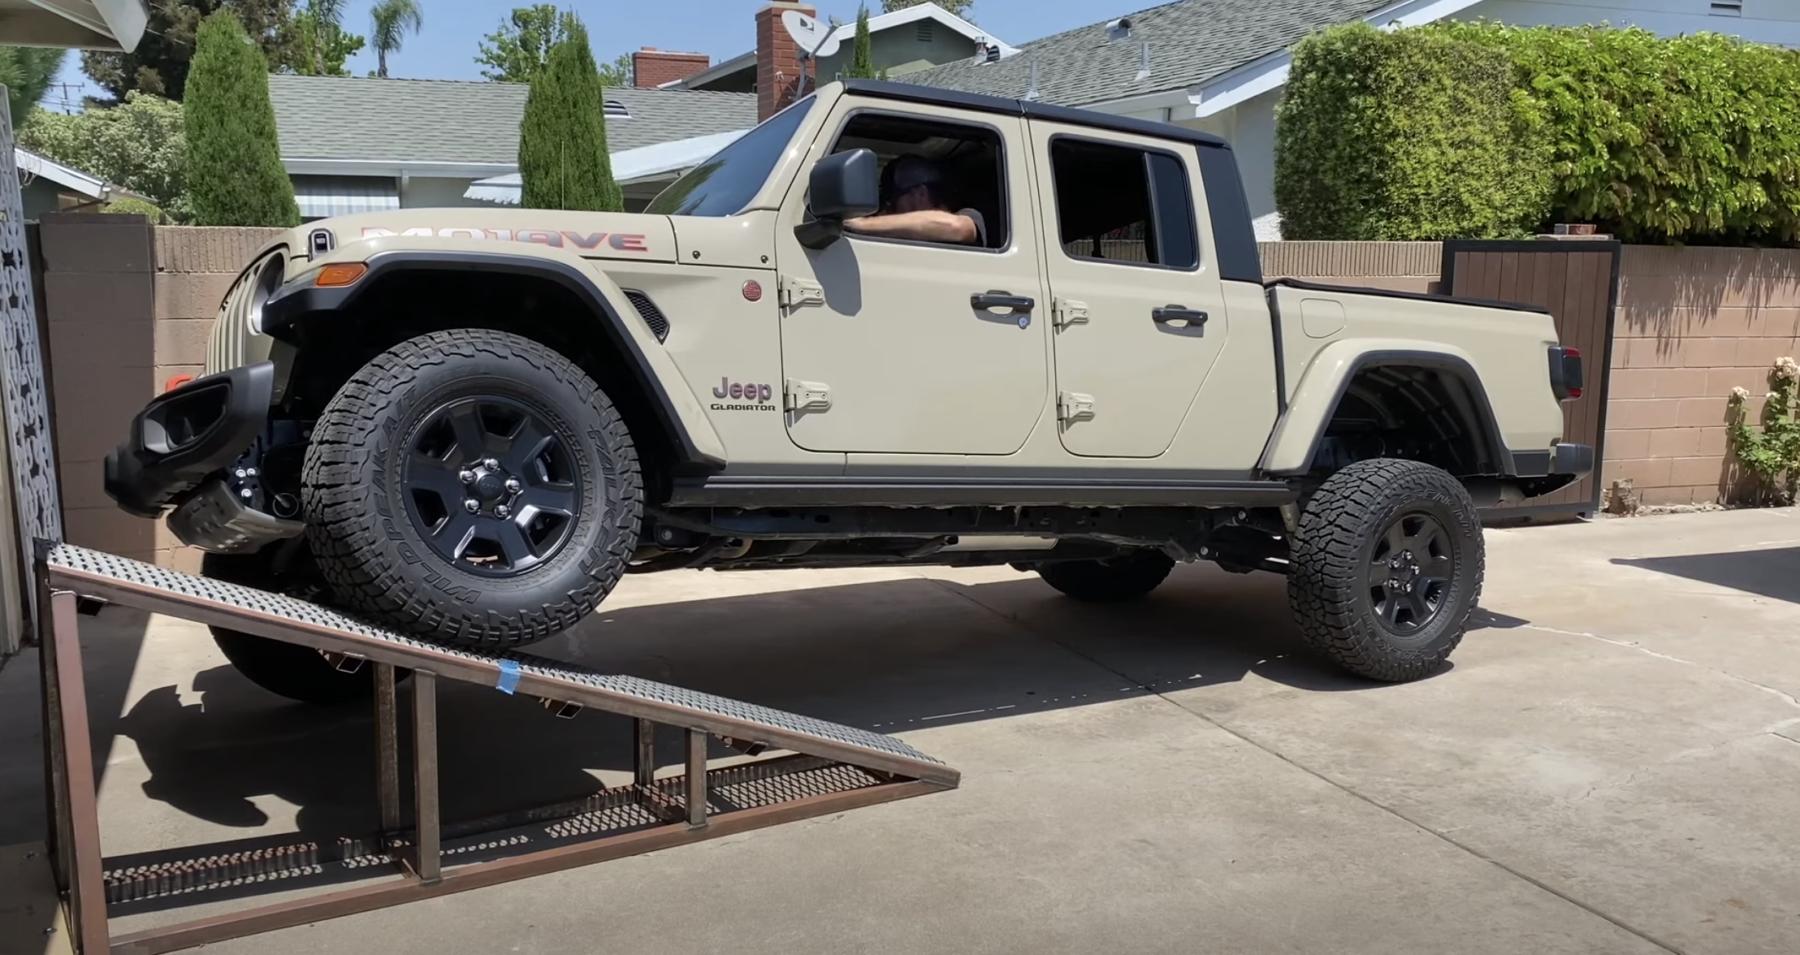 Jeep Gladiator Mojave climbs a ramp